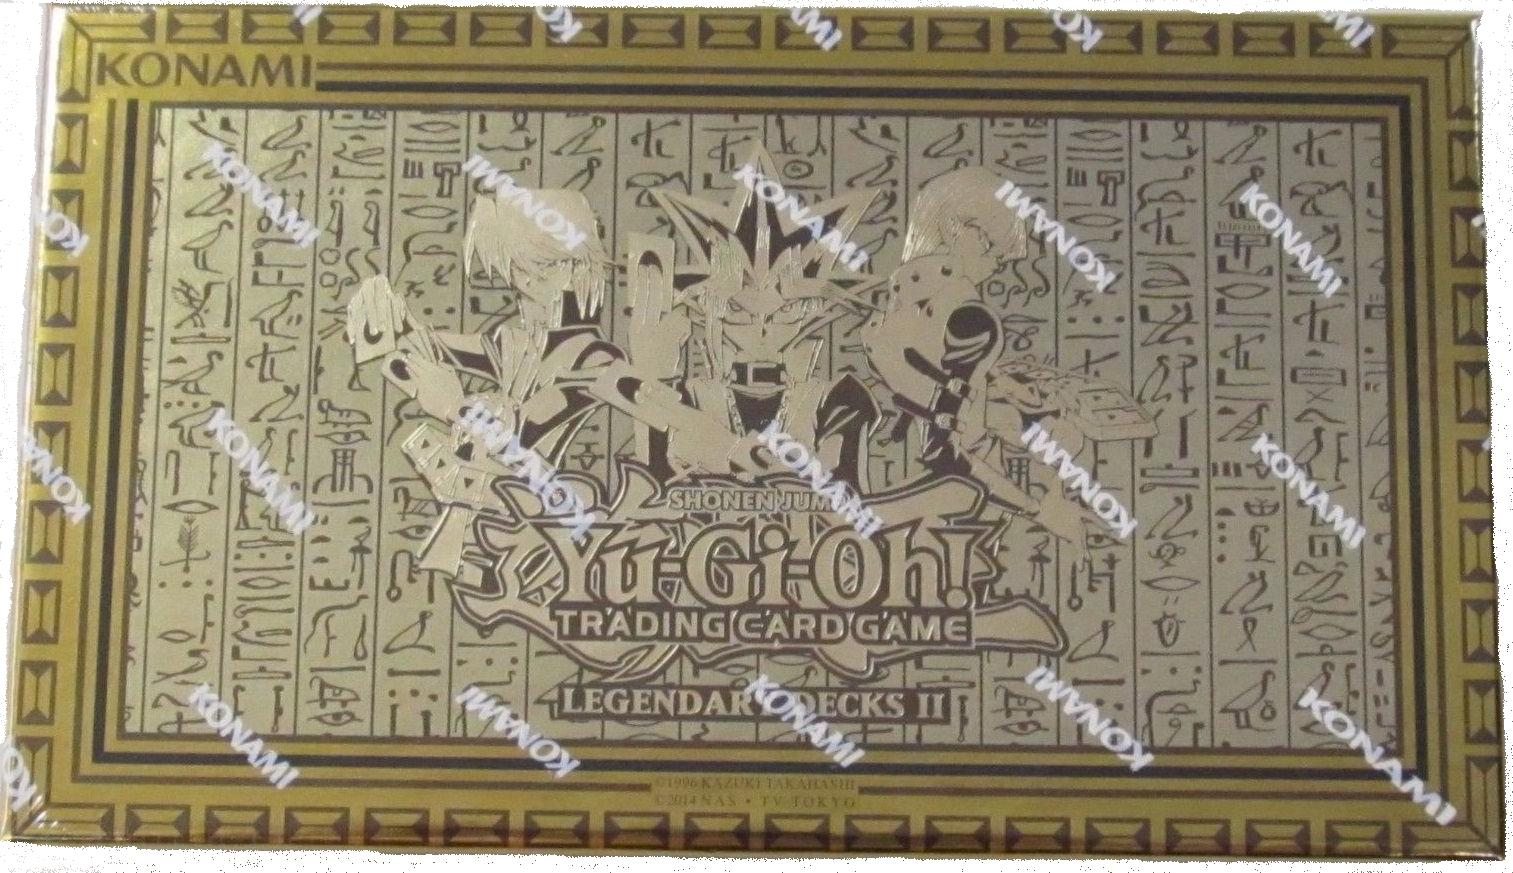 Yu-Gi-Oh! Yugi's Legendary Decks II Collector's Set